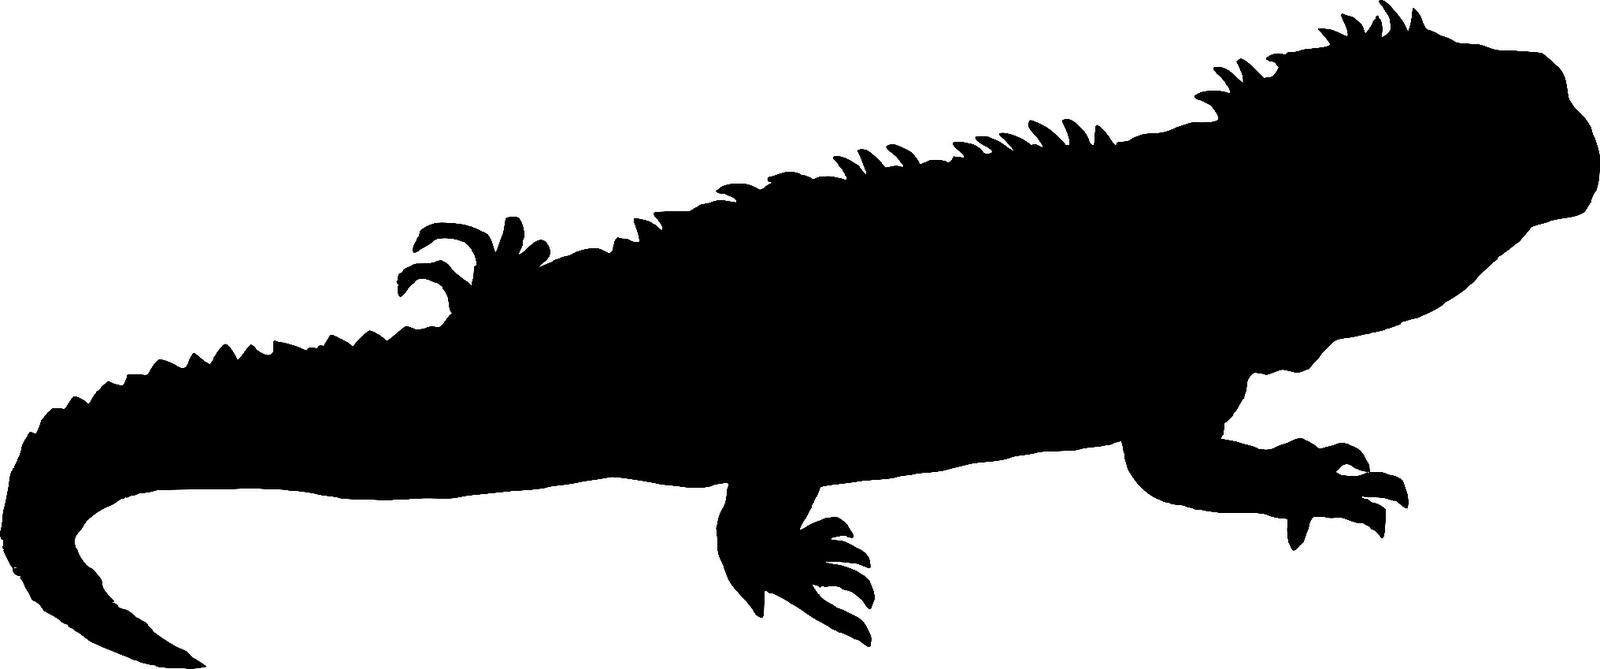 1600x669 Iguana Clipart Silhouette